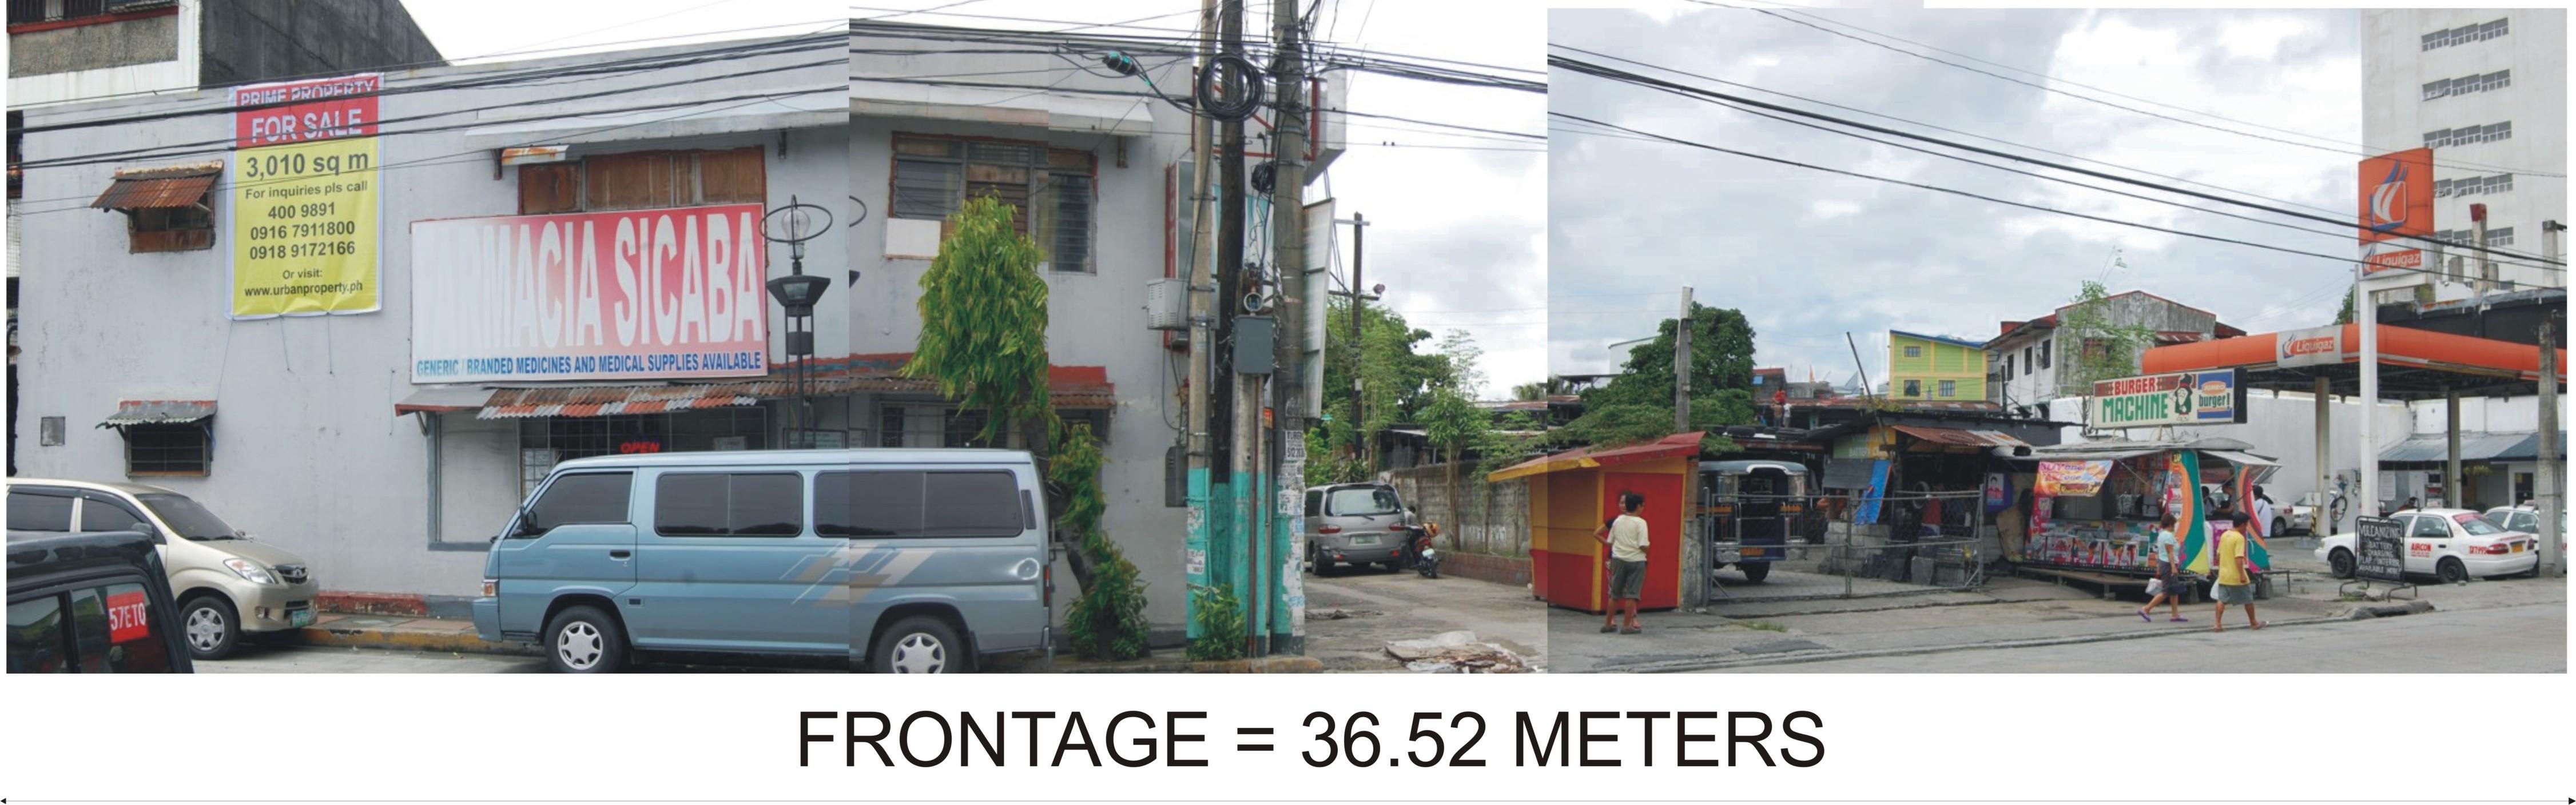 36.52 meter frontage